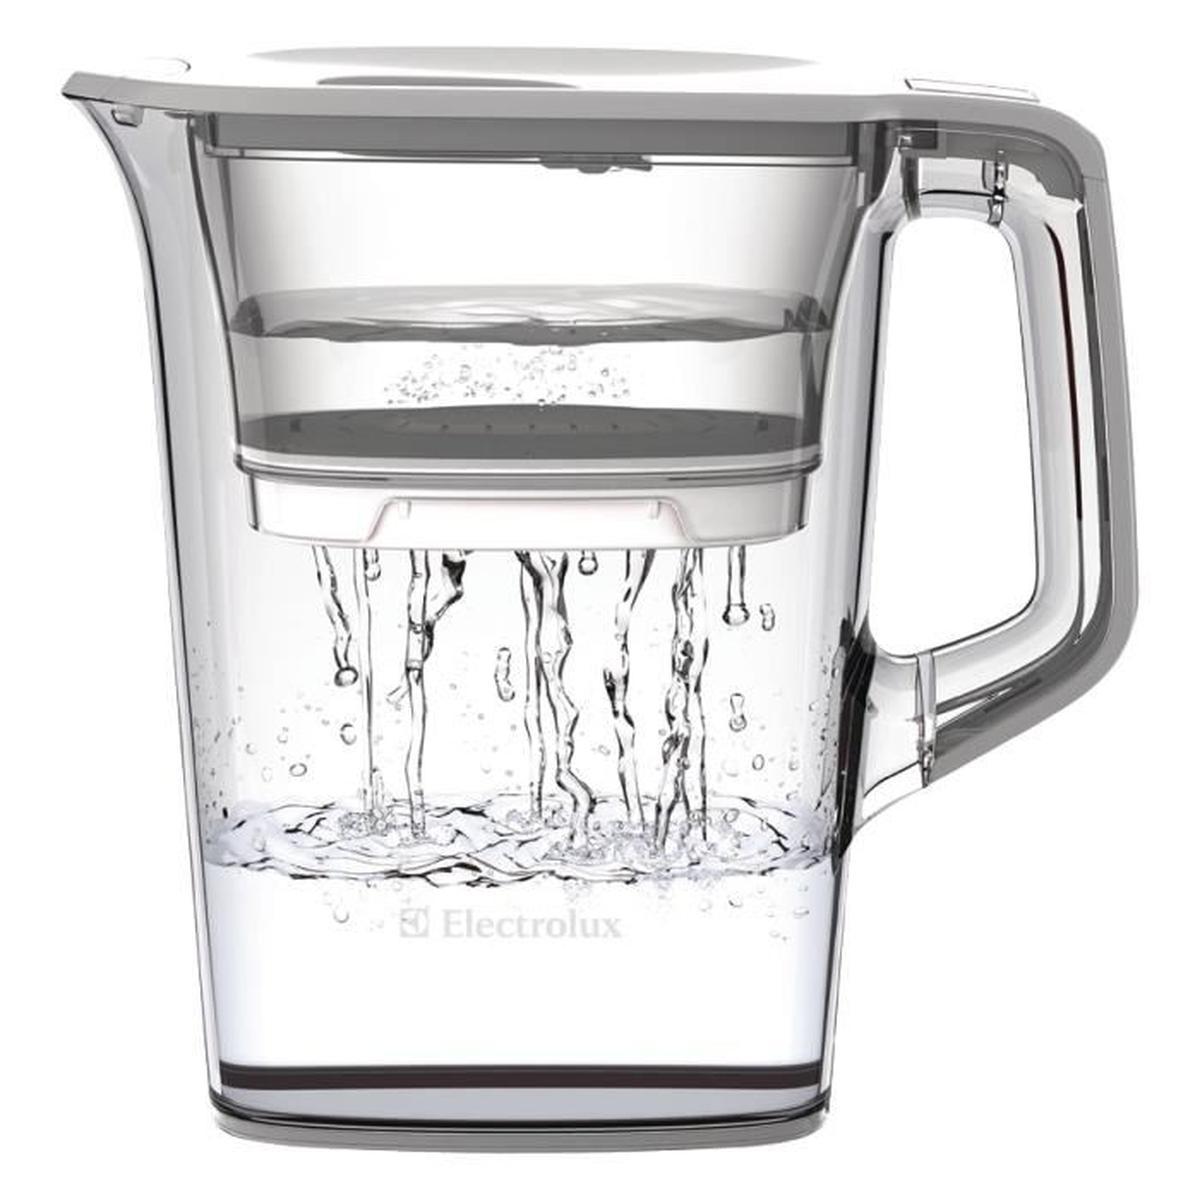 carafe d eau filtrante